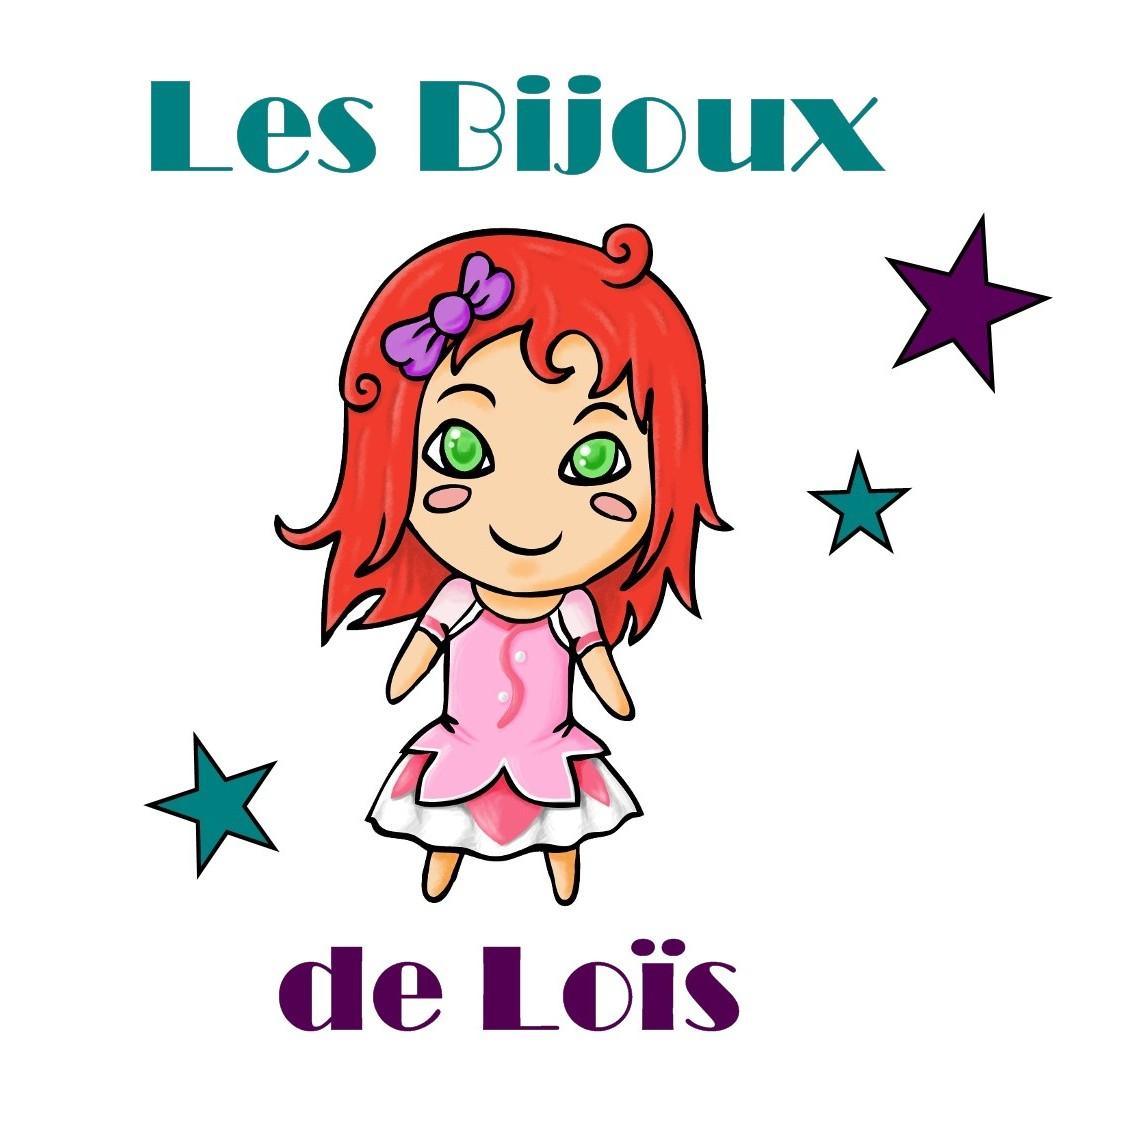 LesBijouxdeLois